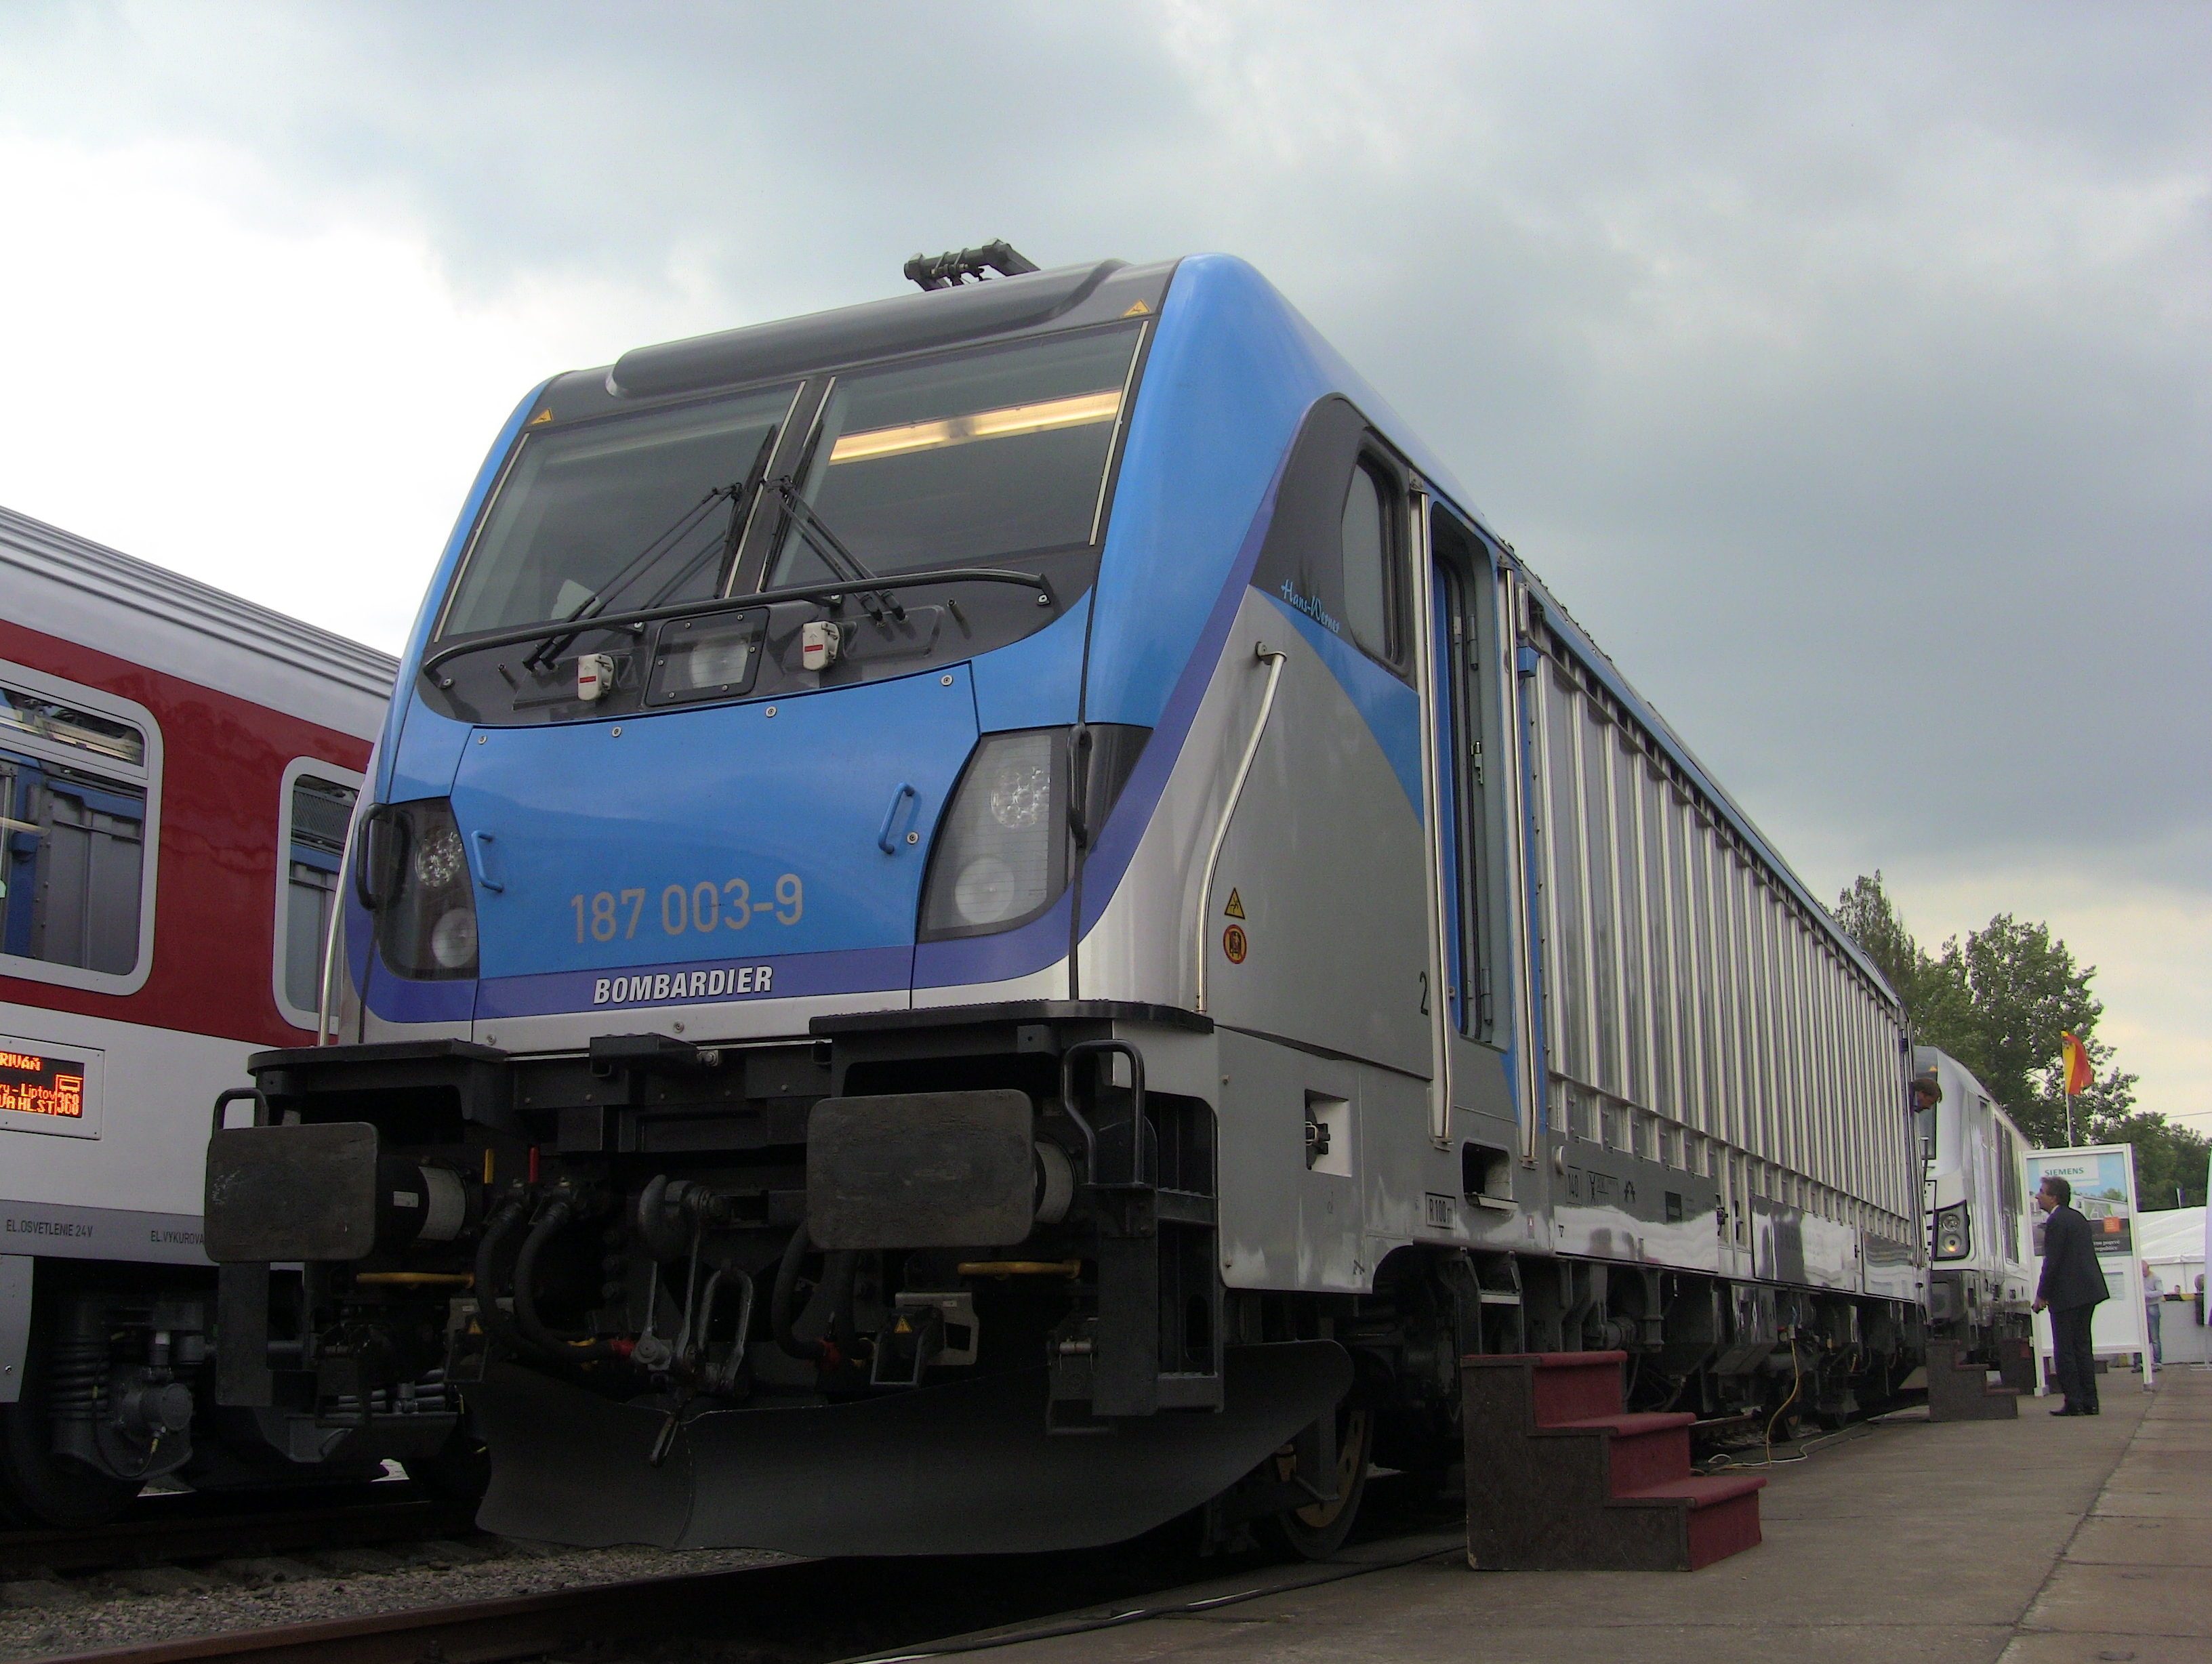 Bombardier Traxx